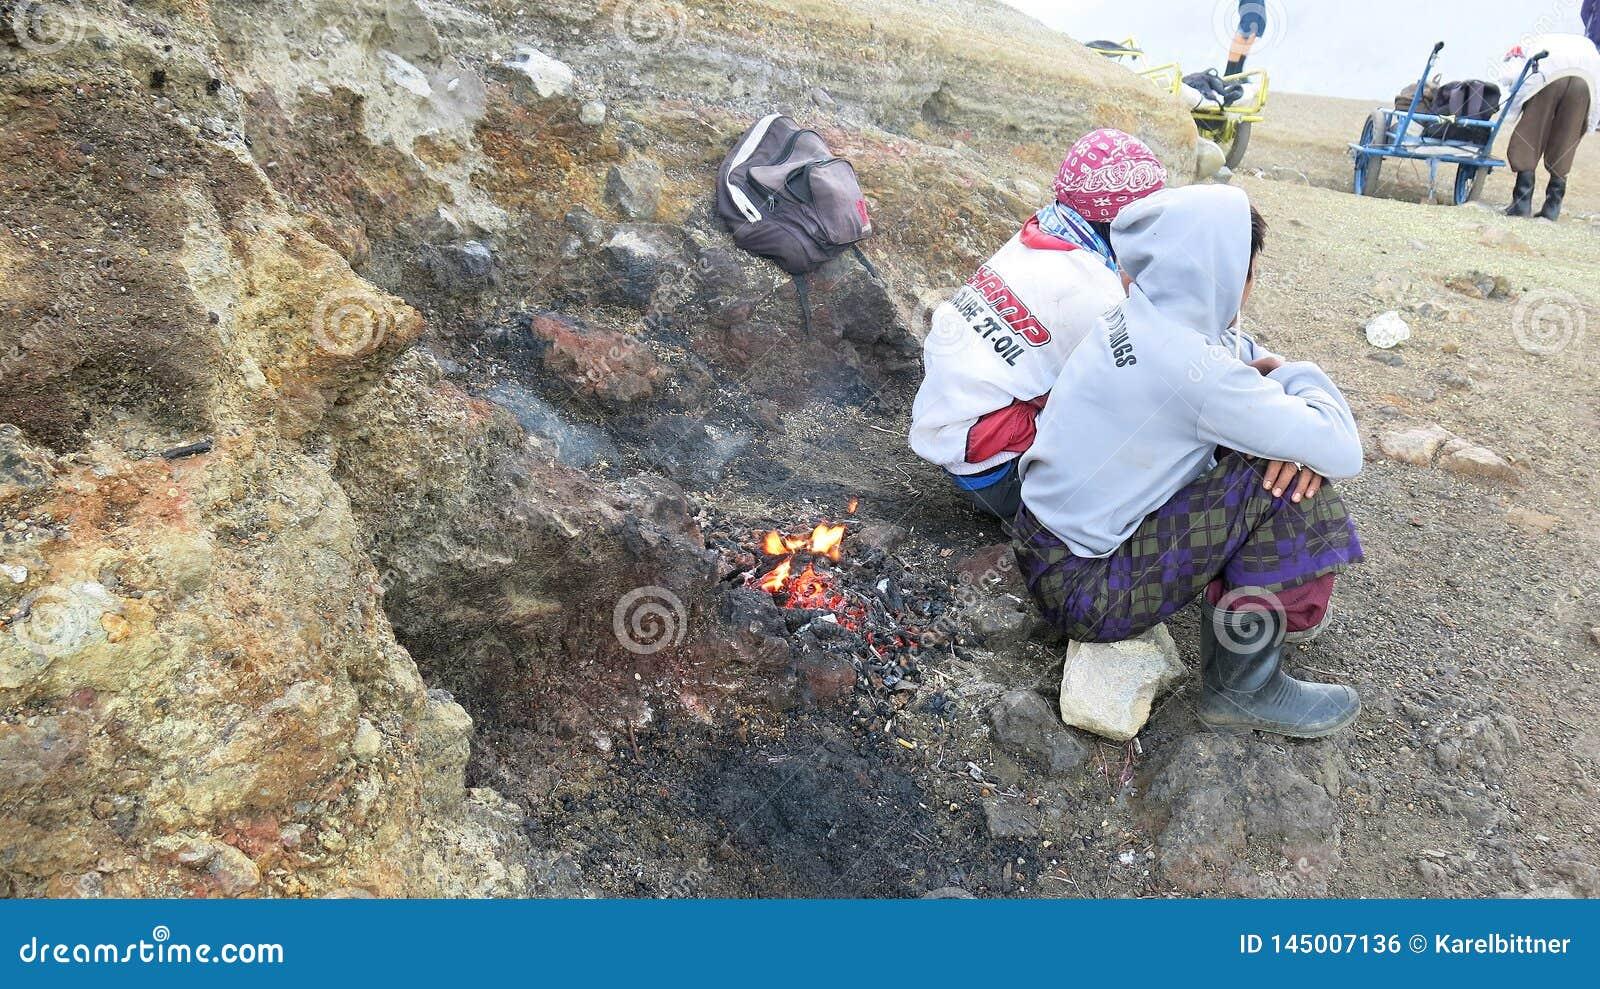 Javanese sulfur miners sitting atop active Kawah Ijen volcano.